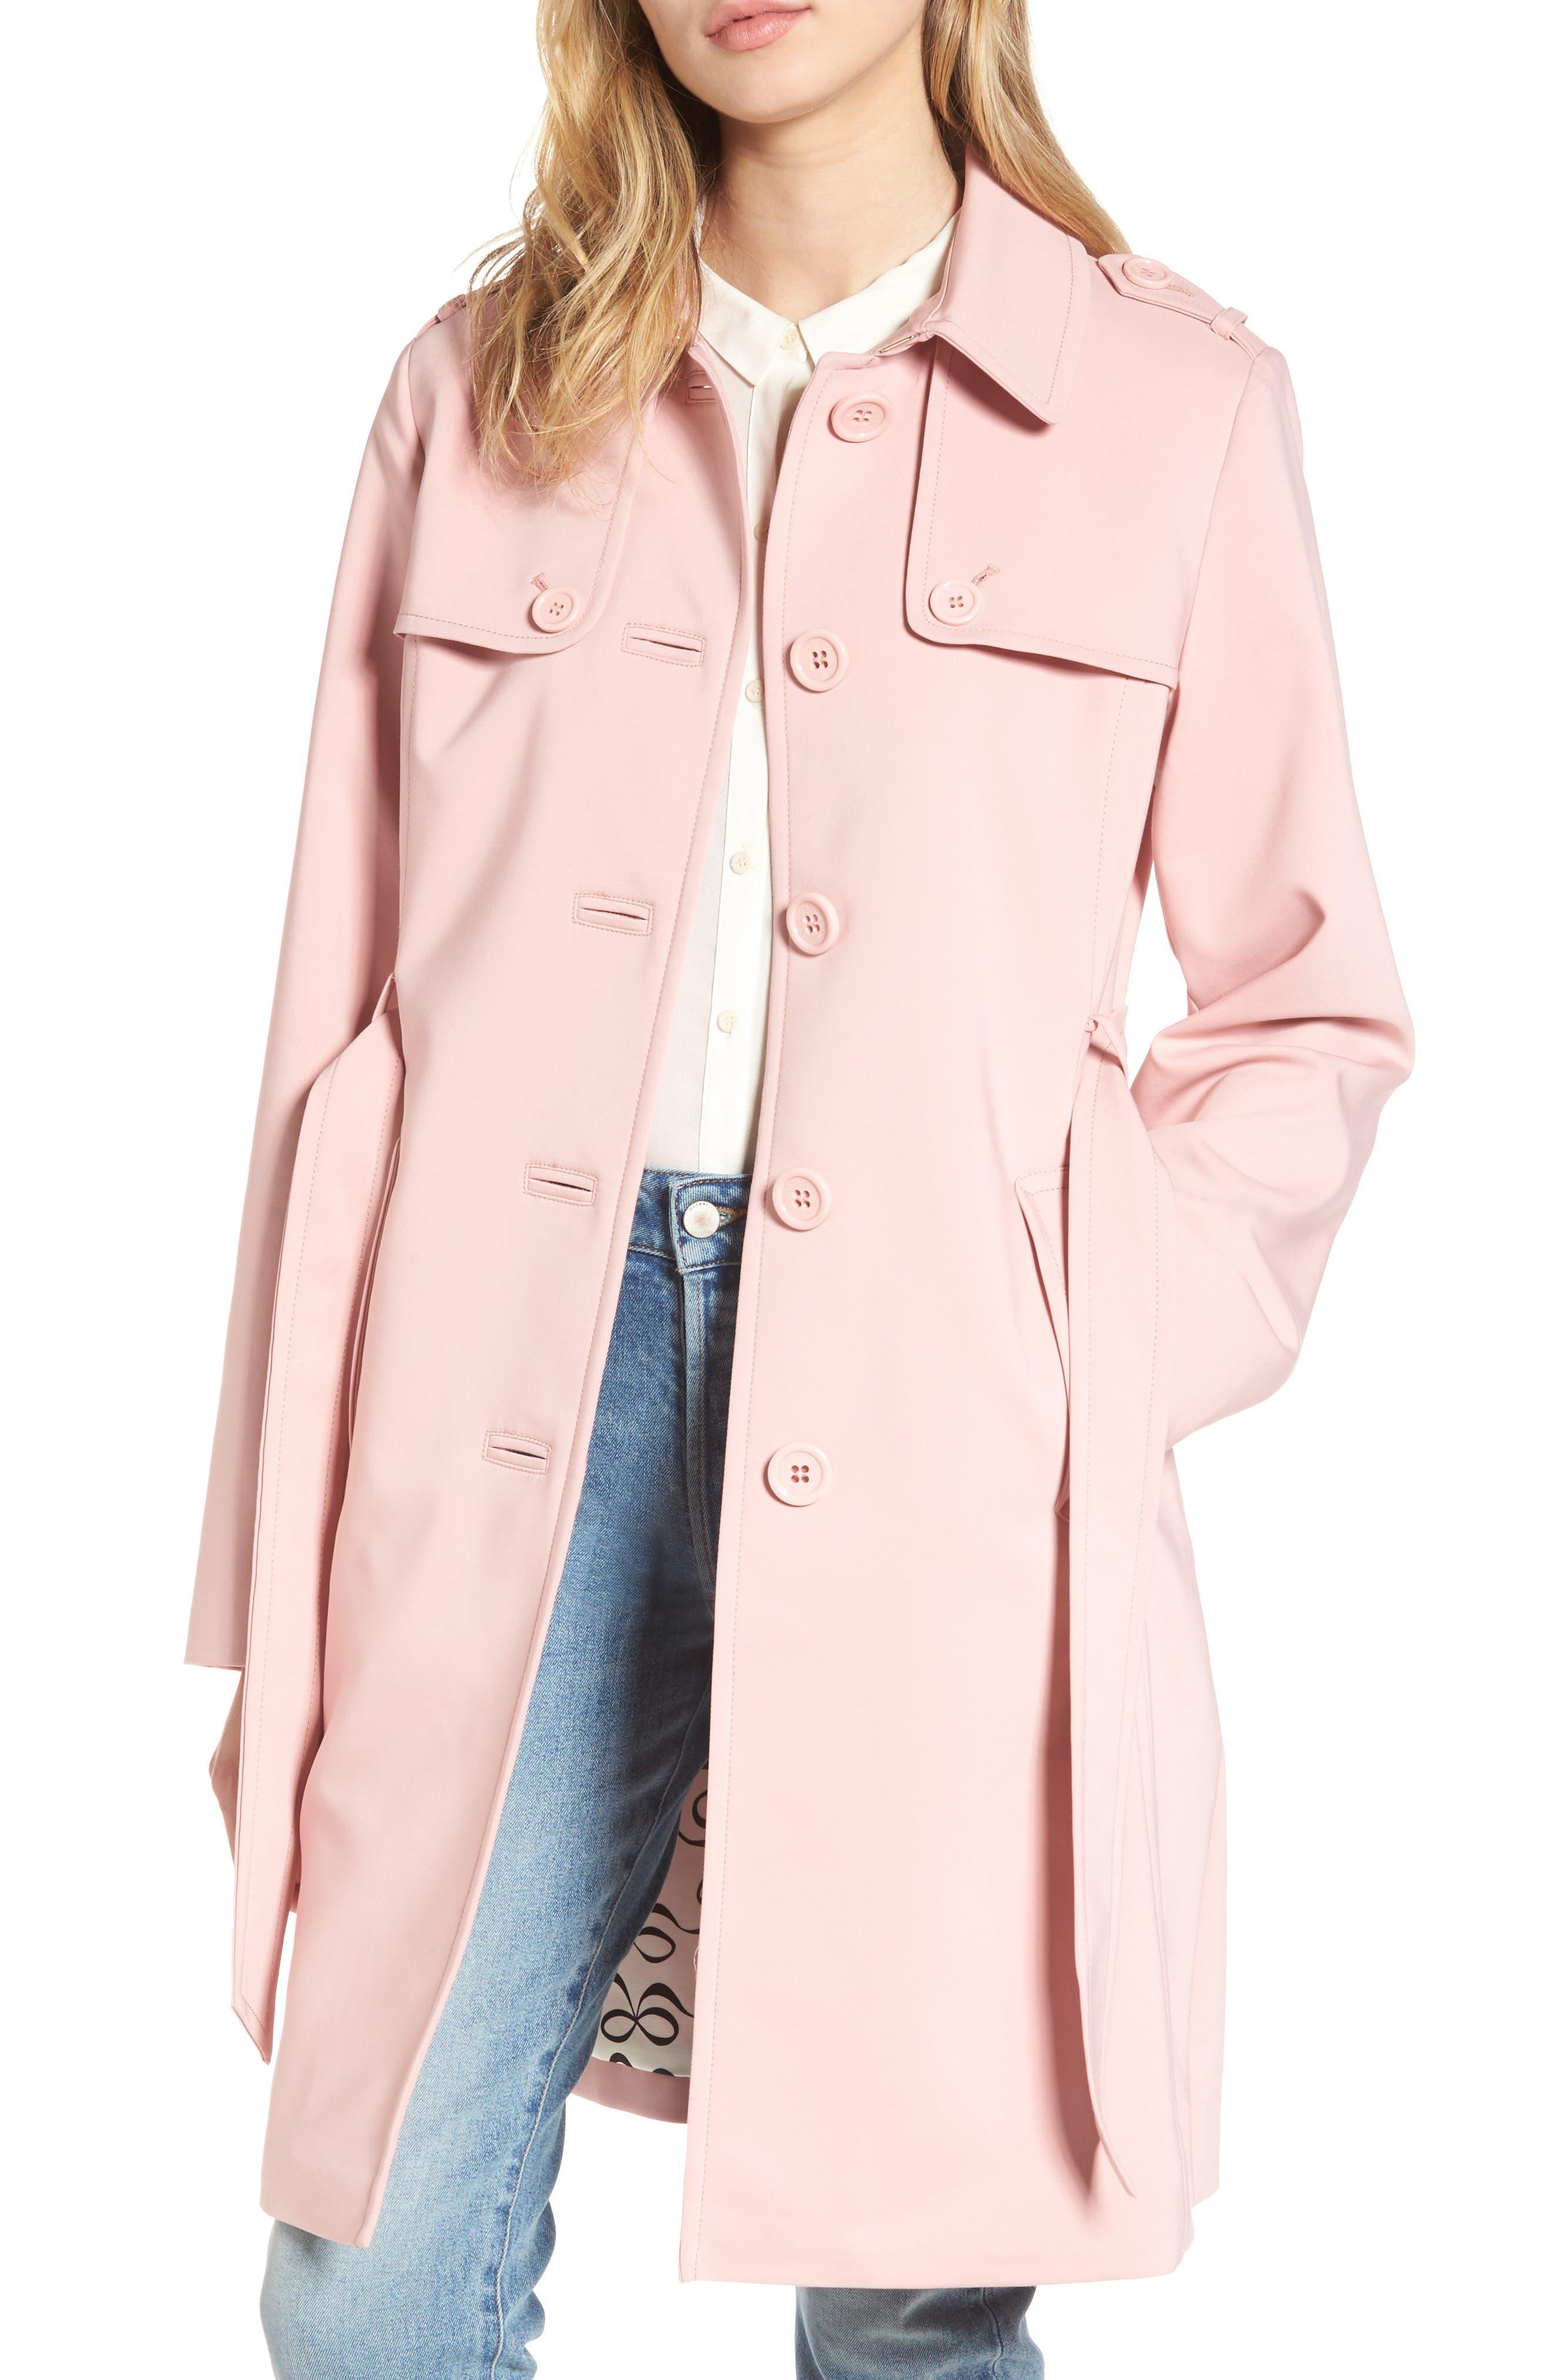 Main Image - kate spade new york 3-in-1 trench coat